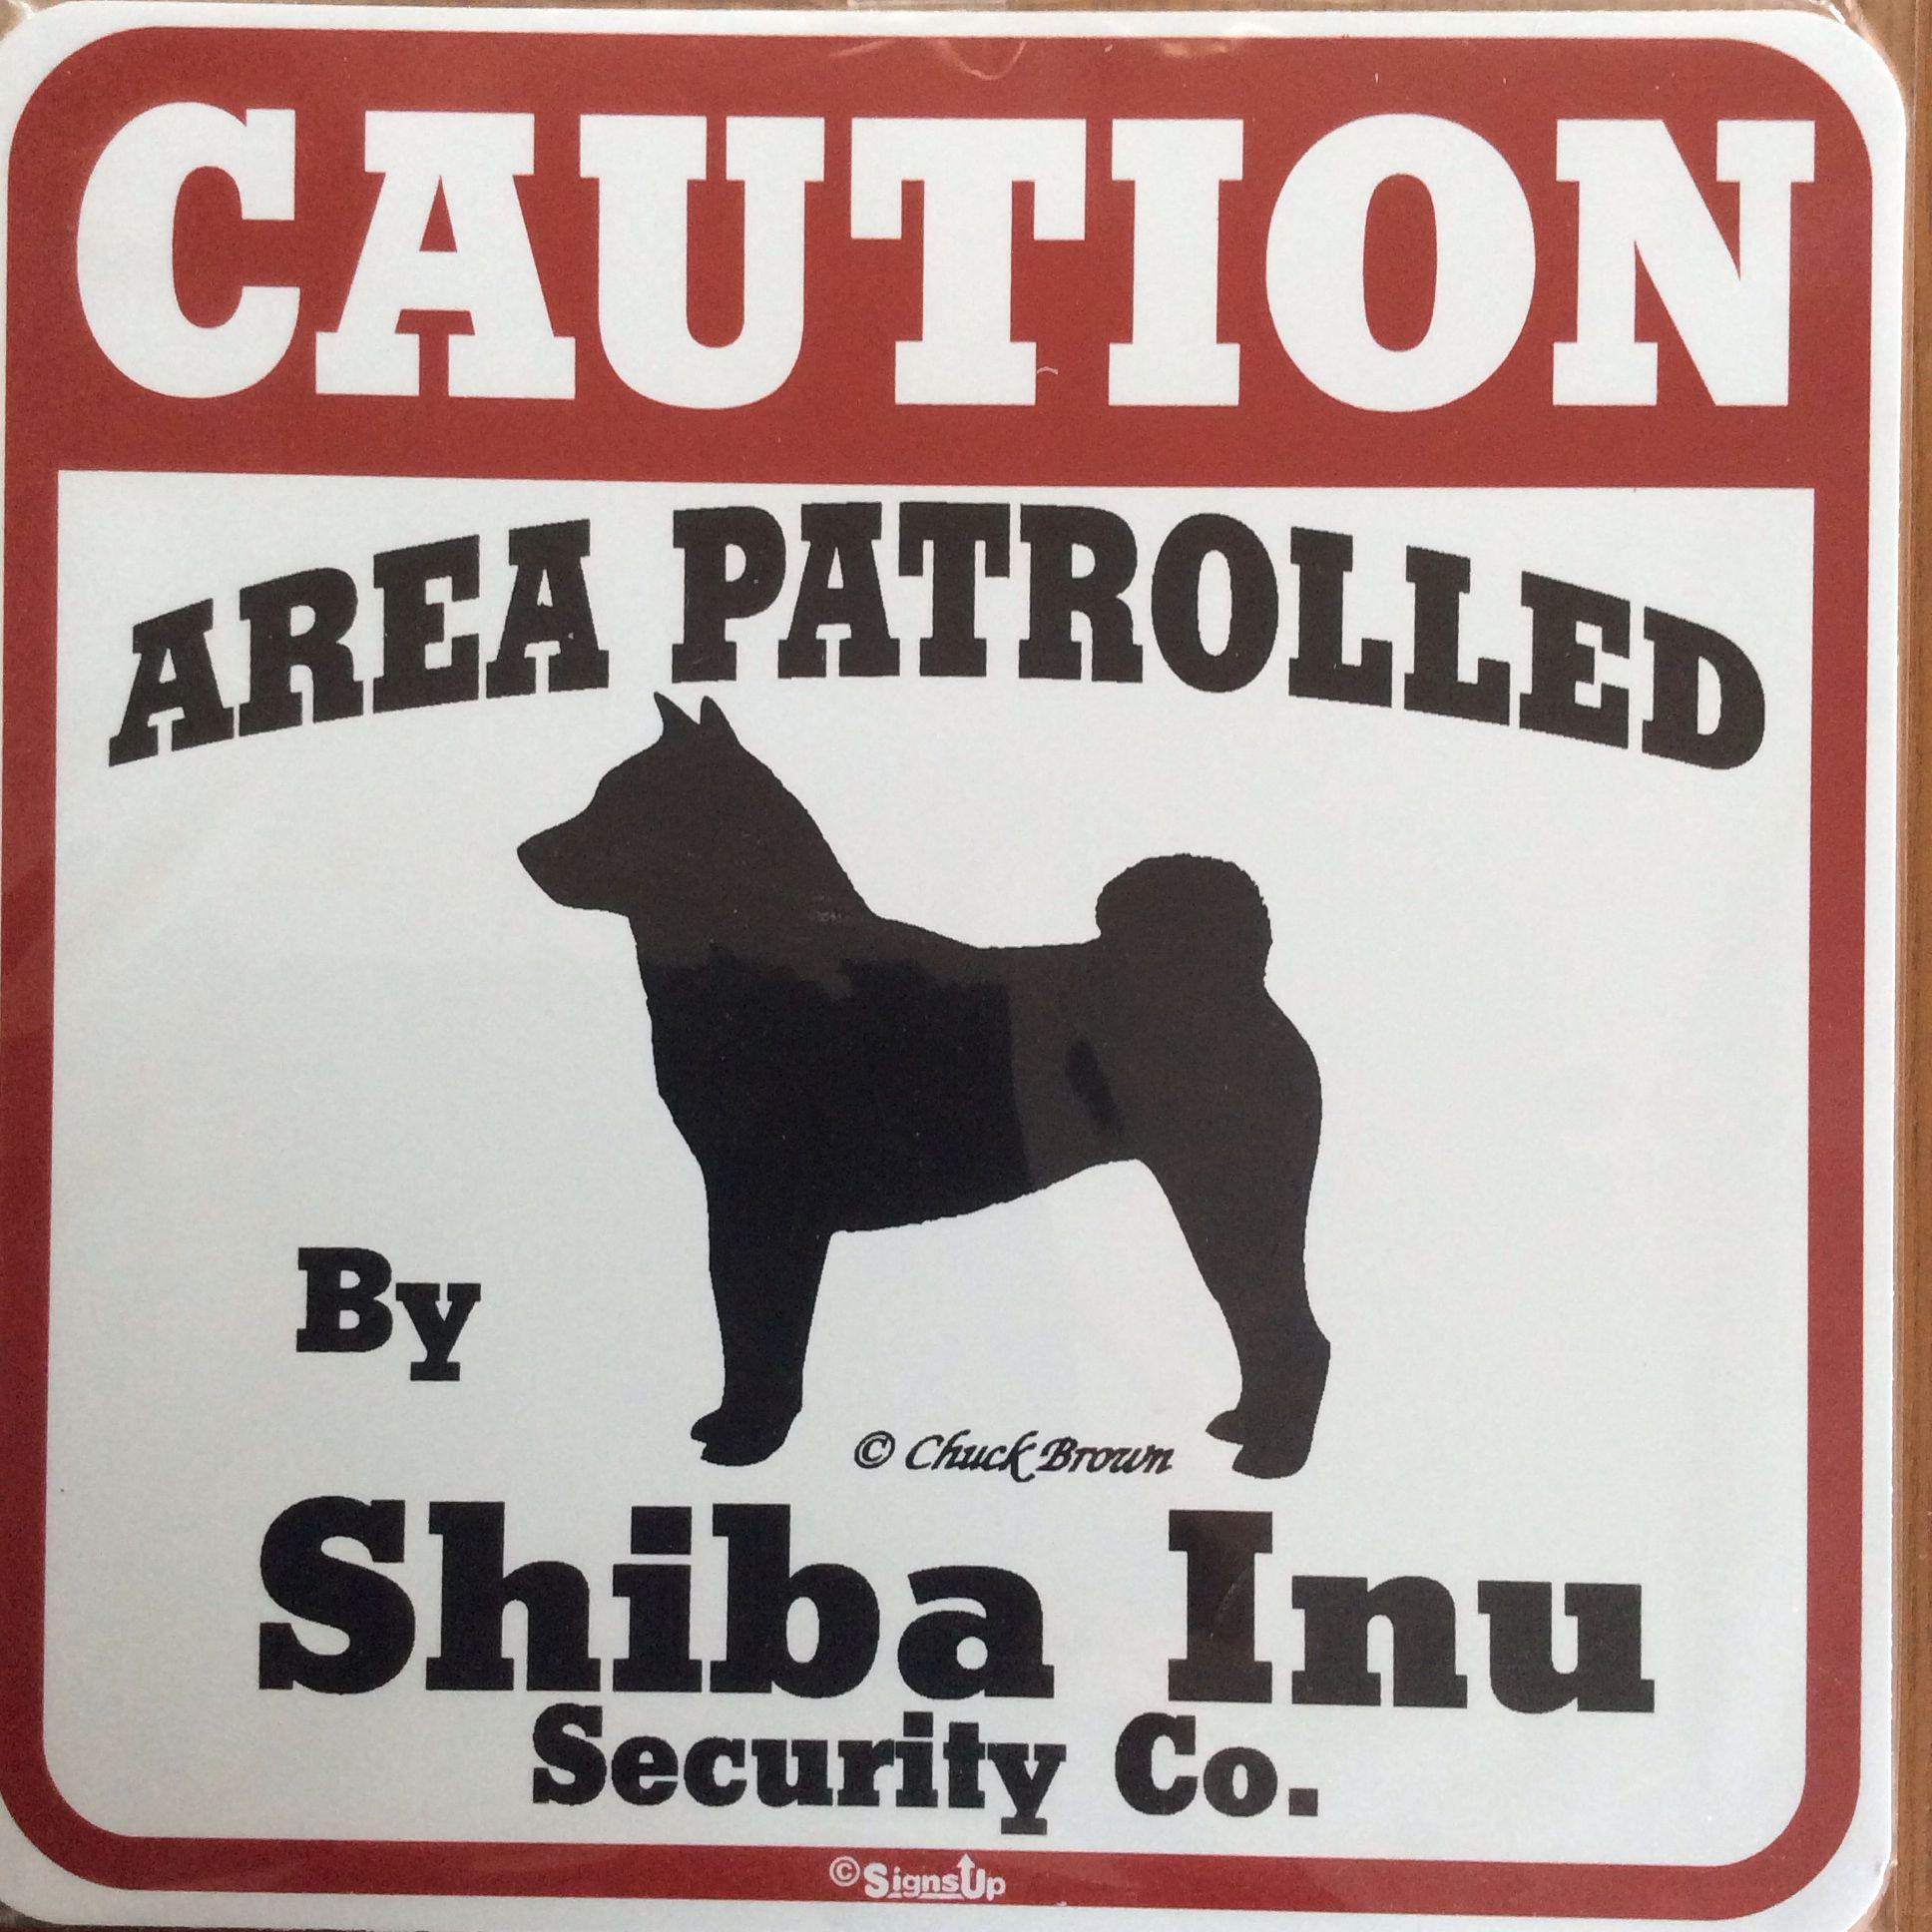 Area patrolled by shiba inu